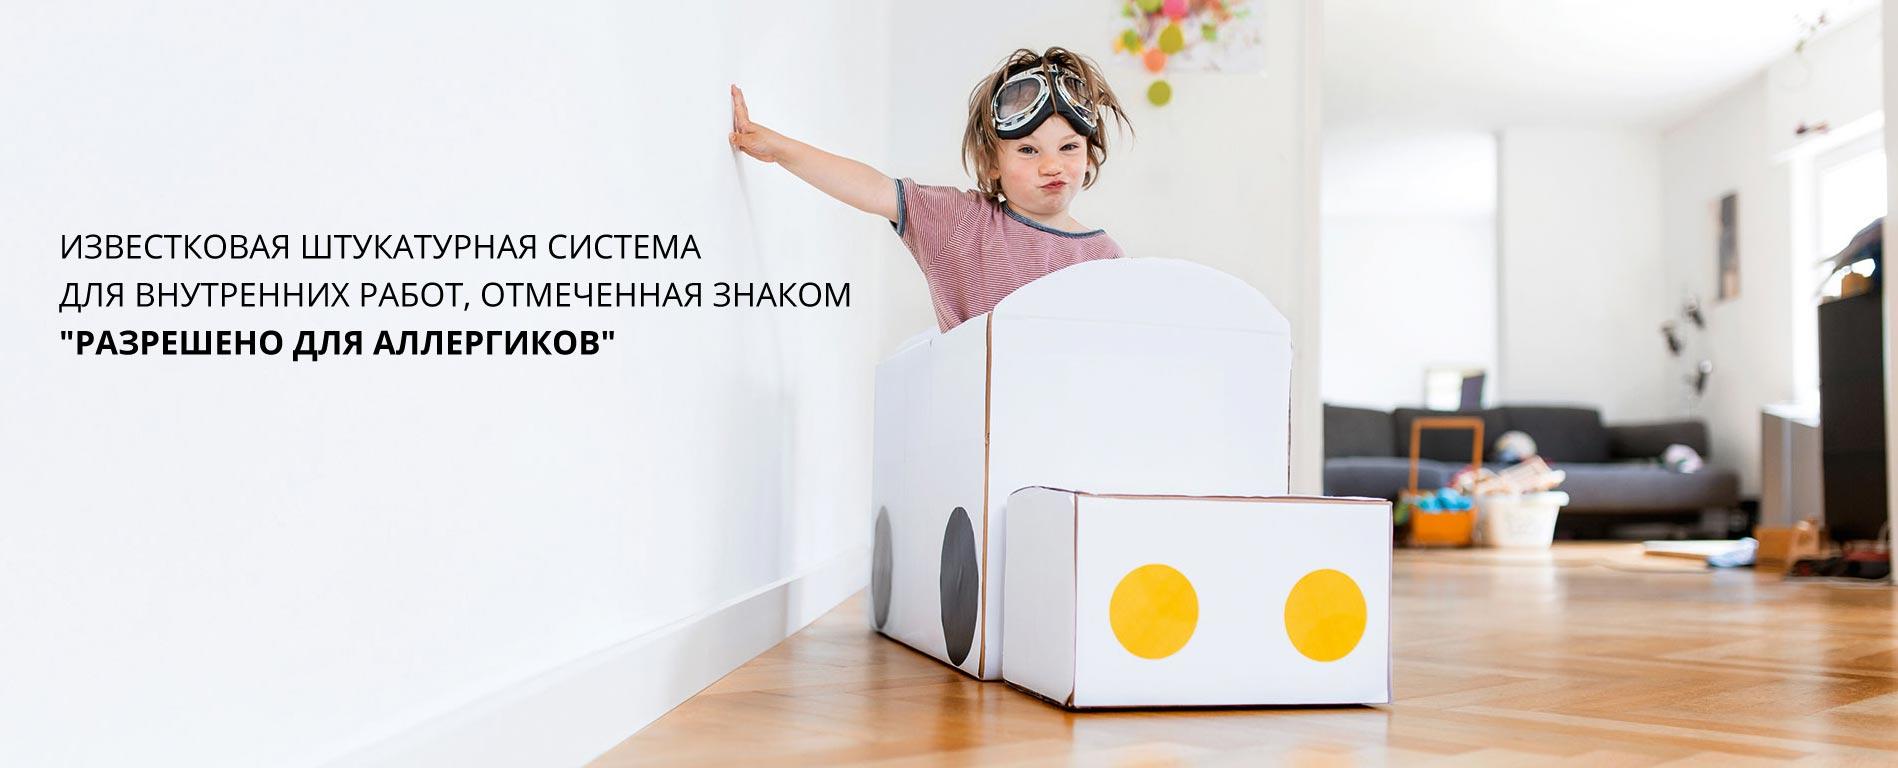 https://microclimate.quickmix.ru/fileadmin/user_upload/www.kalk-innenputz.de/Home/home-kalk-innenputz-ru-desktop.jpg